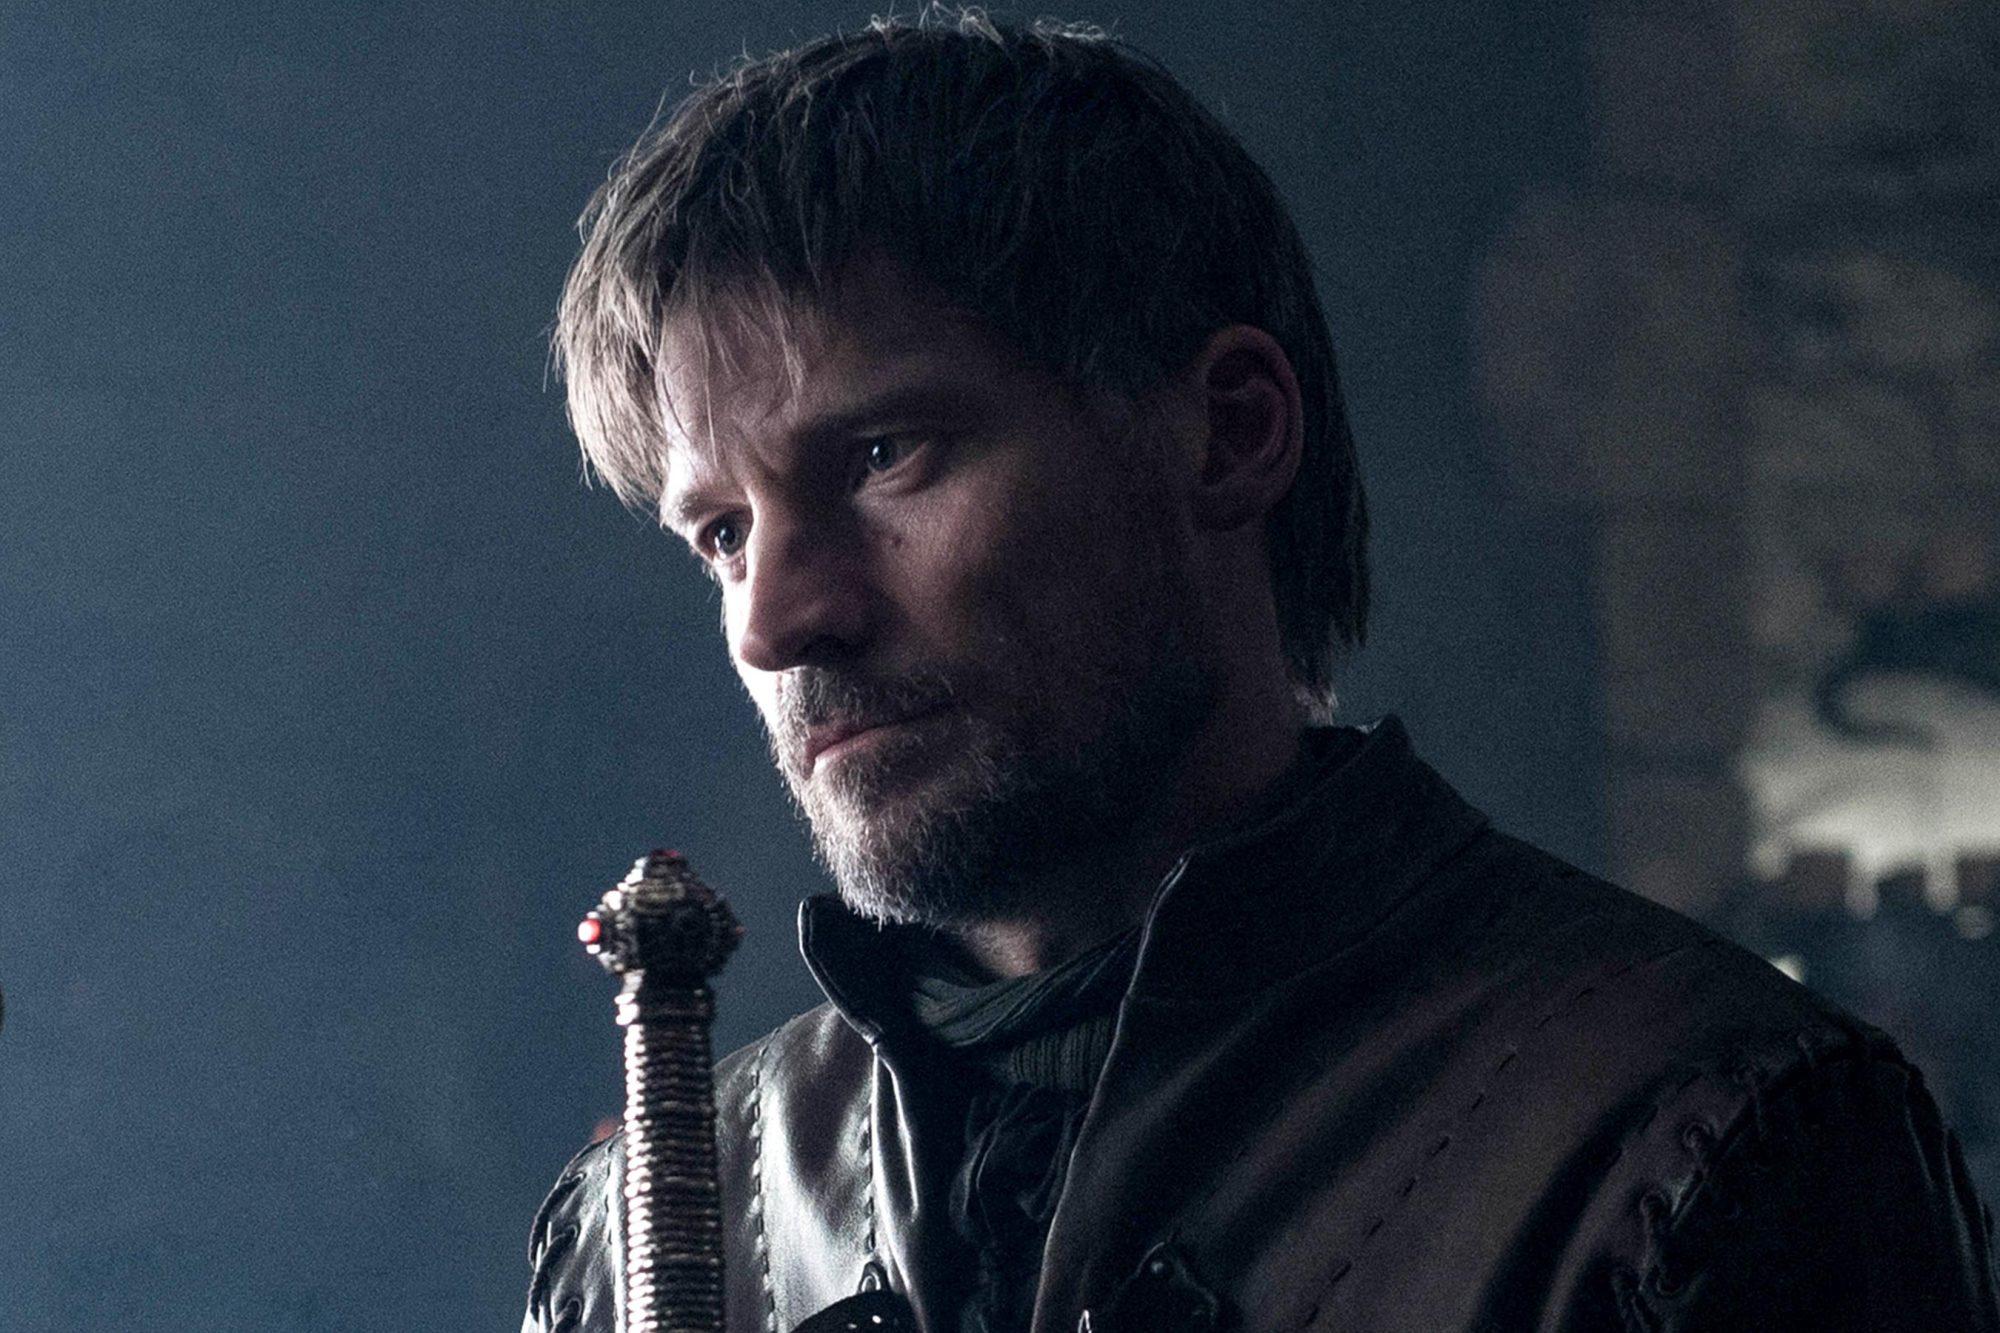 Game of Thrones Season 8, episode 2 (debut 4/21/19): Nikolaj Coster-Waldau as Jaime Lannister Credit: Helen Sloan/HBO